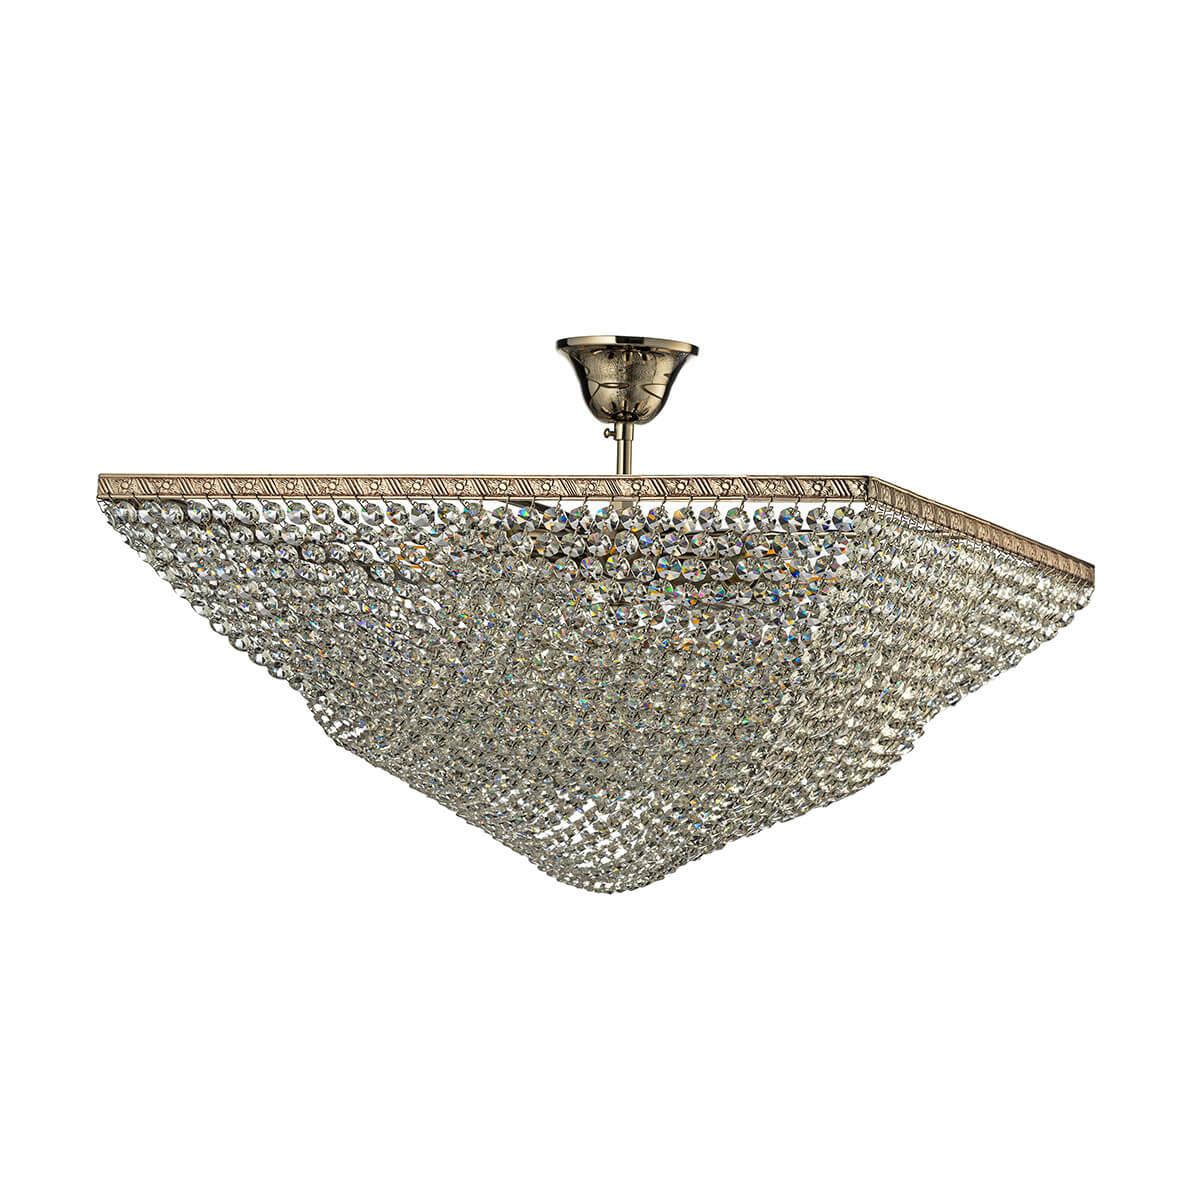 Потолочный светильник Arti Lampadari Nobile E 1.3.50.502 N